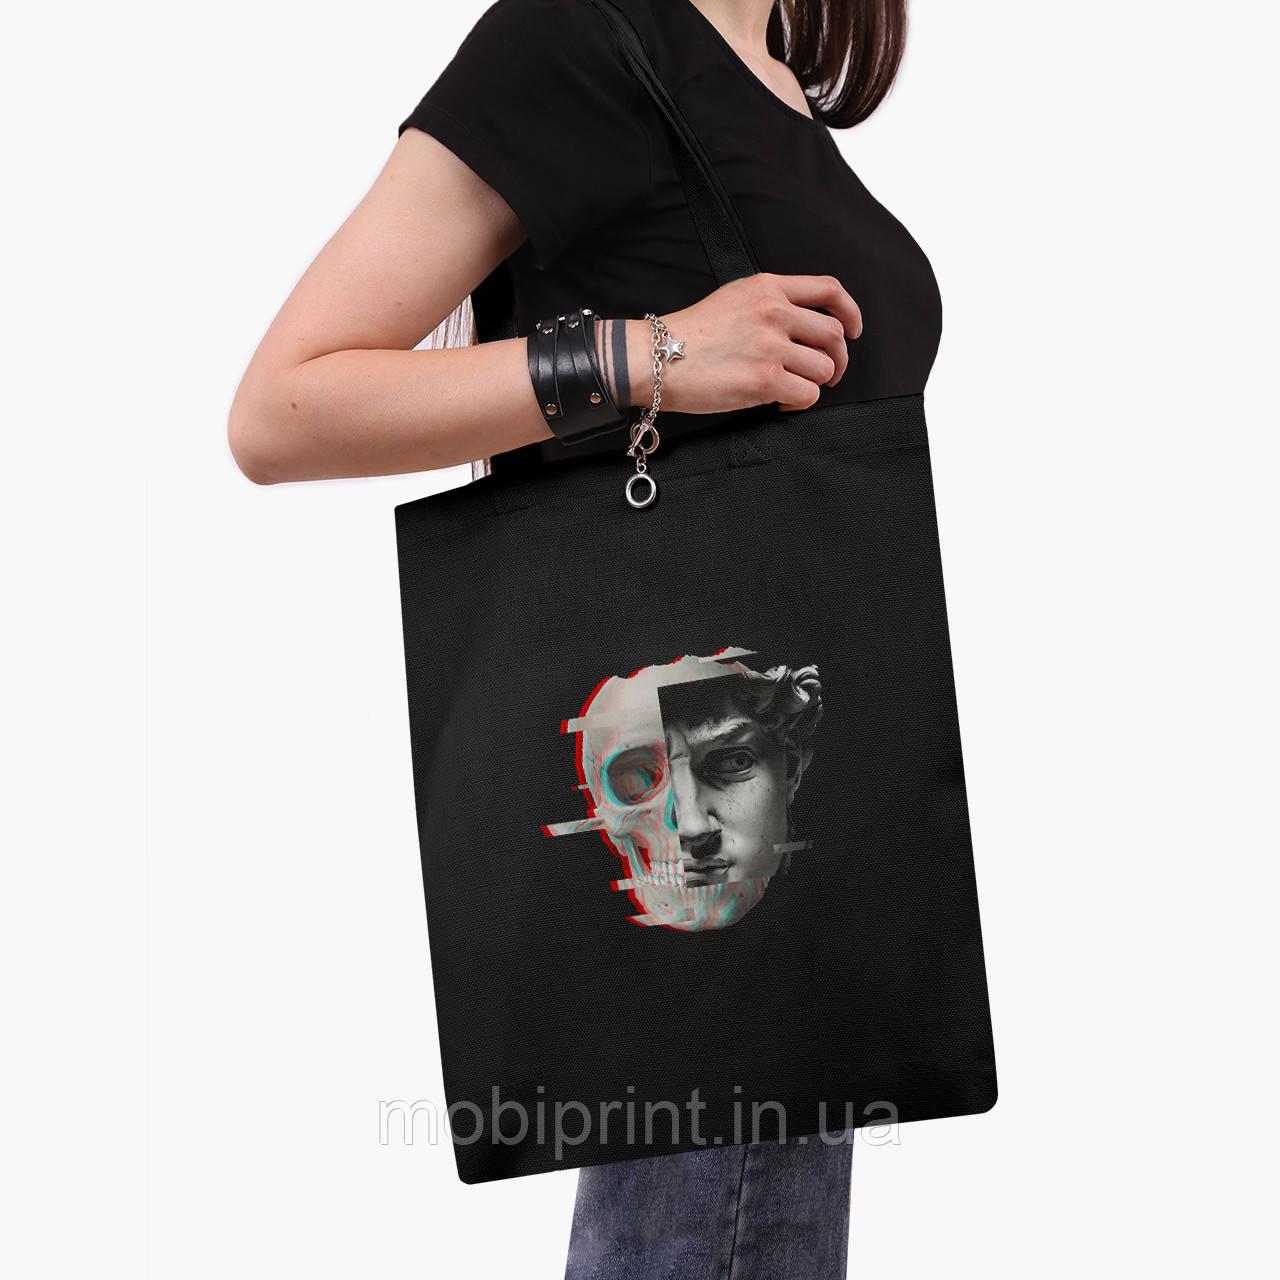 Еко сумка шоппер чорна Ренесанс-Давид (David Renaissance) (9227-1585-2) экосумка шопер 41*35 см